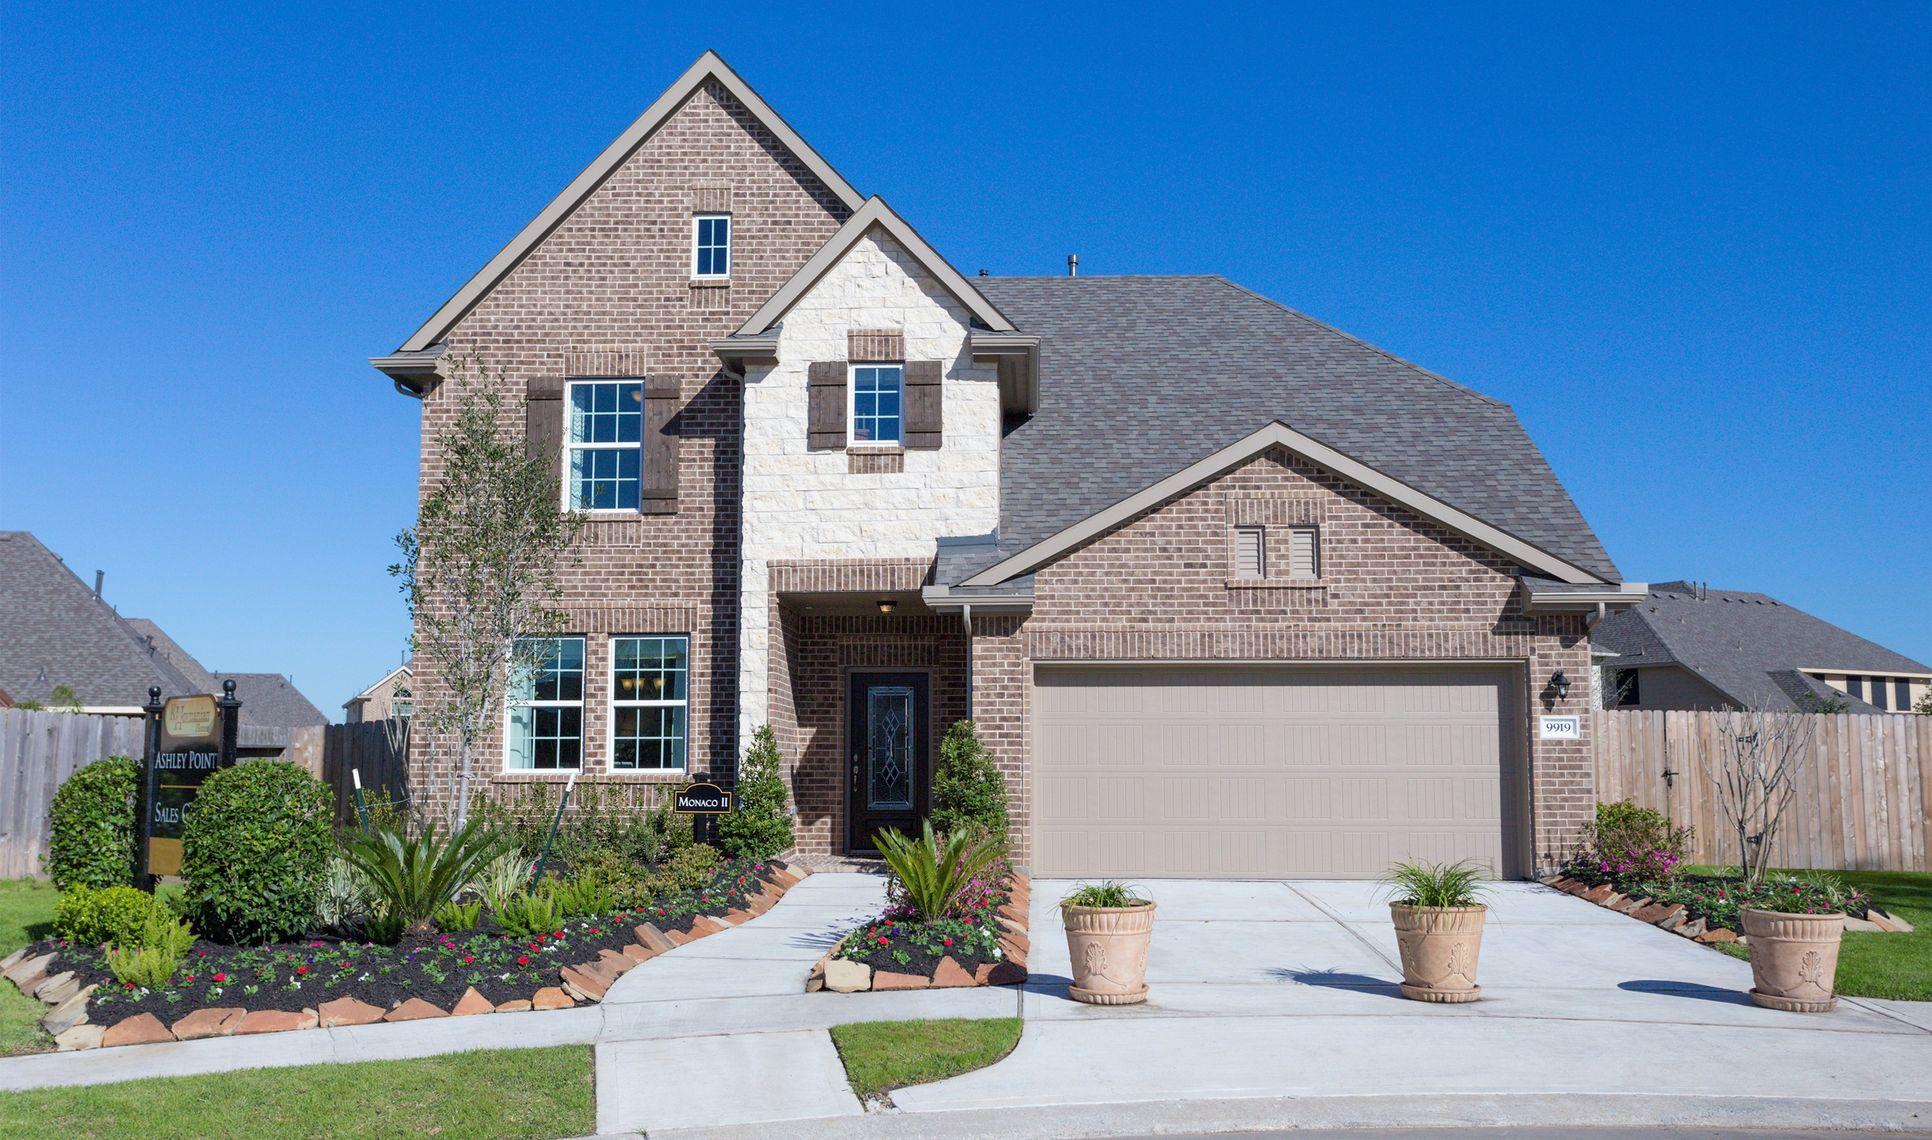 Ashley Pointe - 50' Homesites in Houston, TX :: New Homes ...